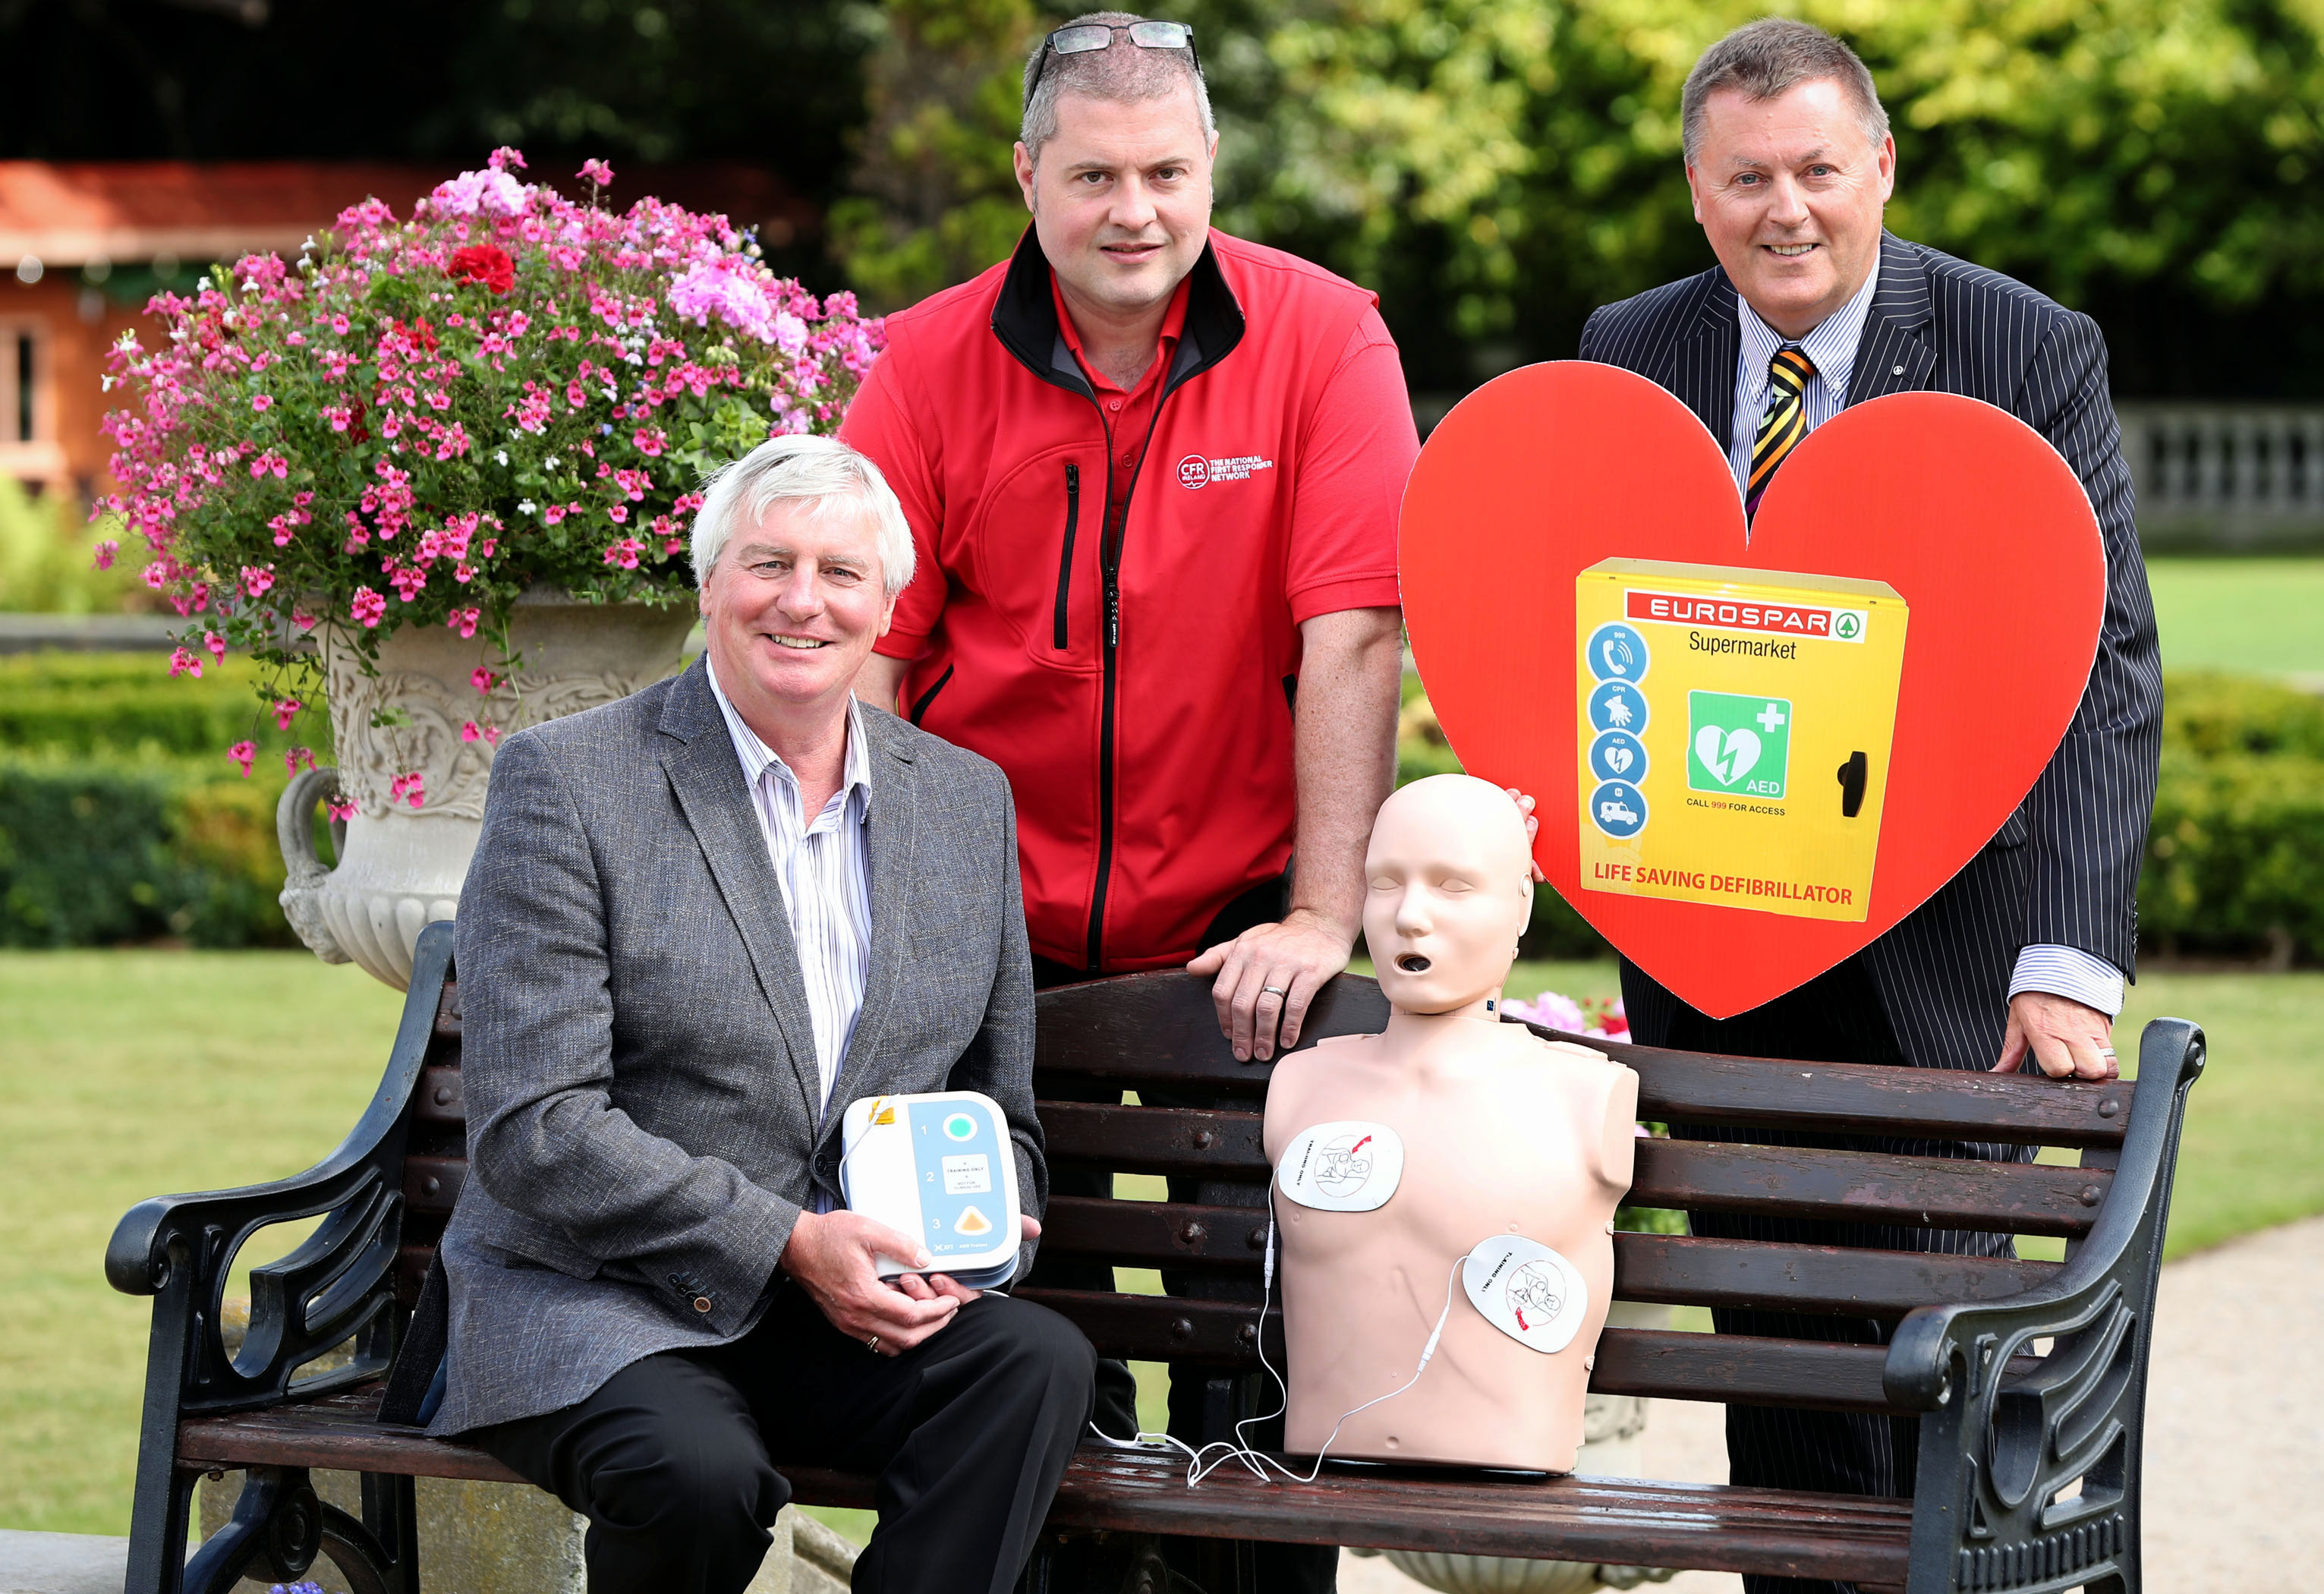 EUROSPAR Ireland defibrillator